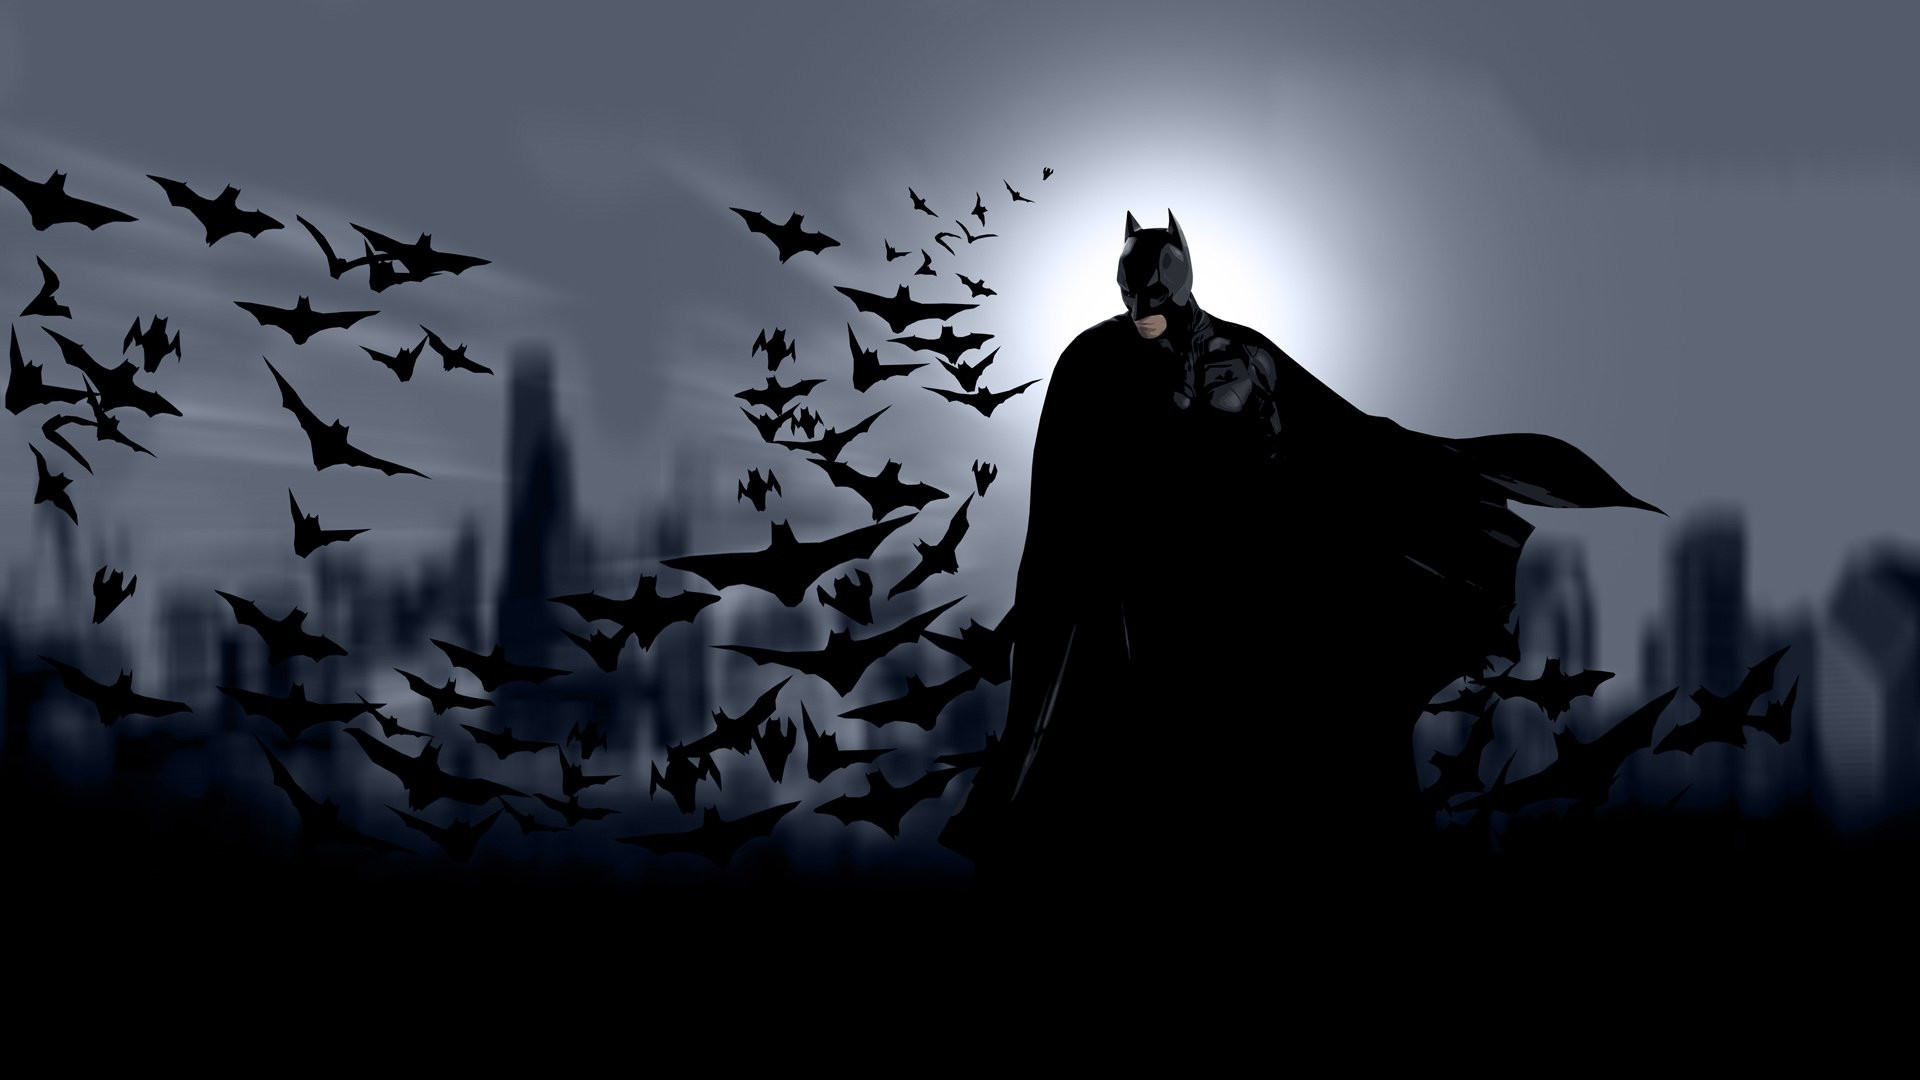 HD Wallpaper   Background ID:72397. Comics Batman